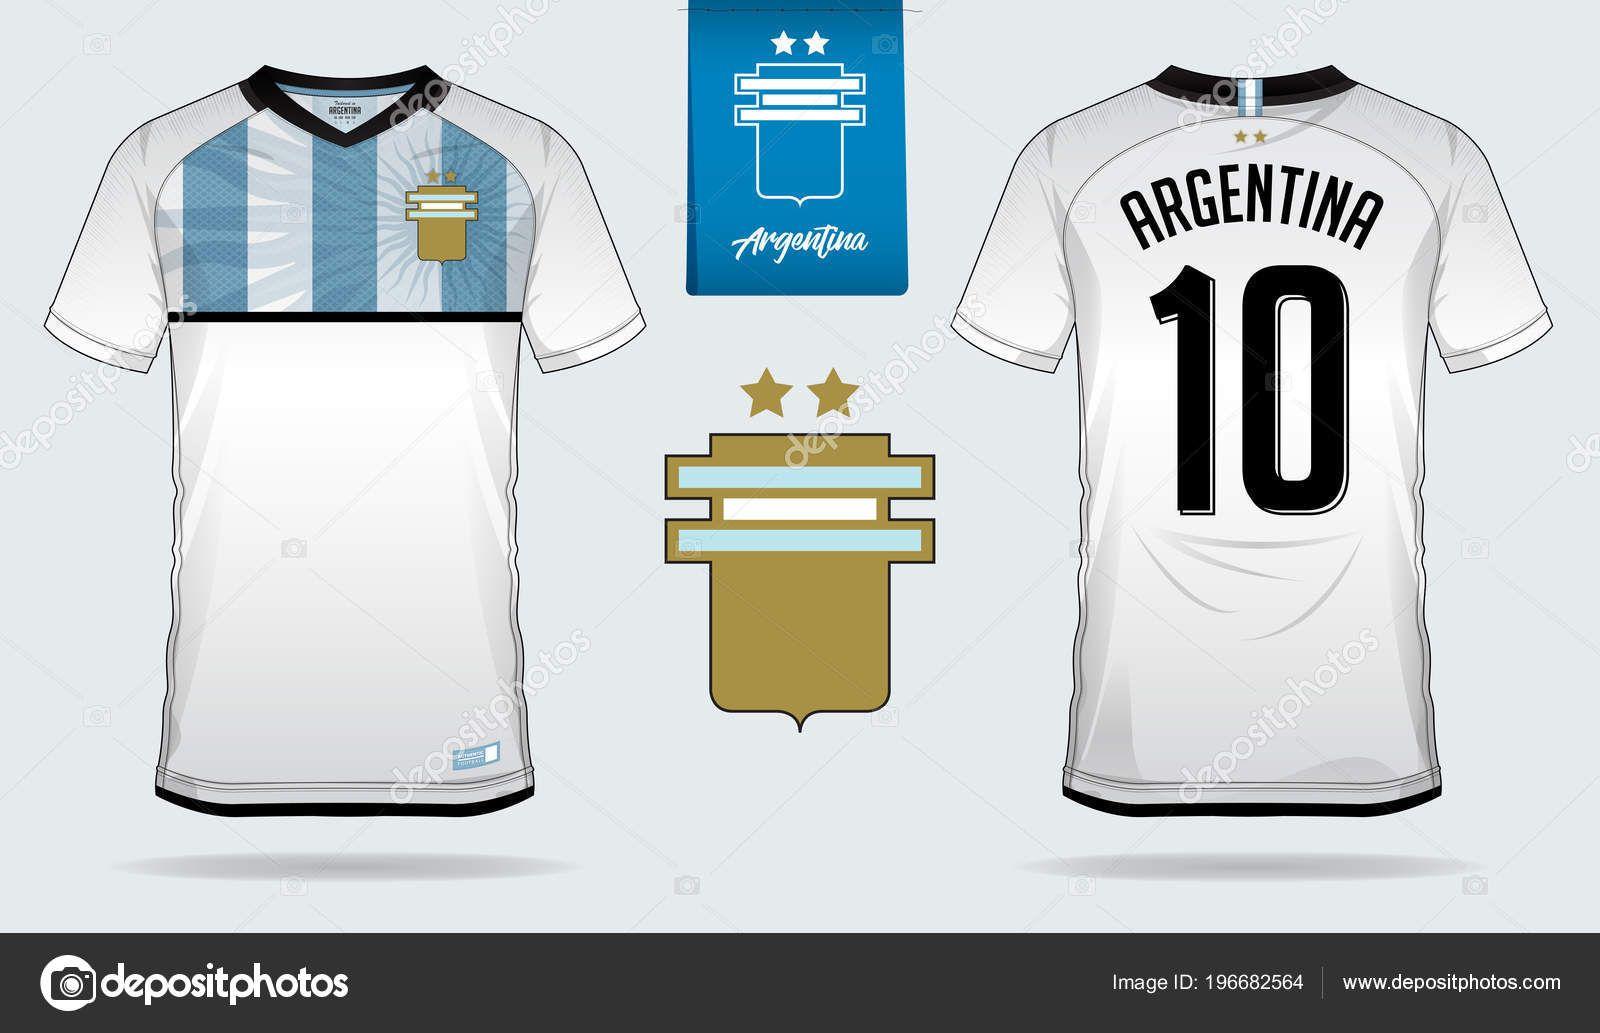 Argentina Football Tshirts Football Kits Soccer Uniforms